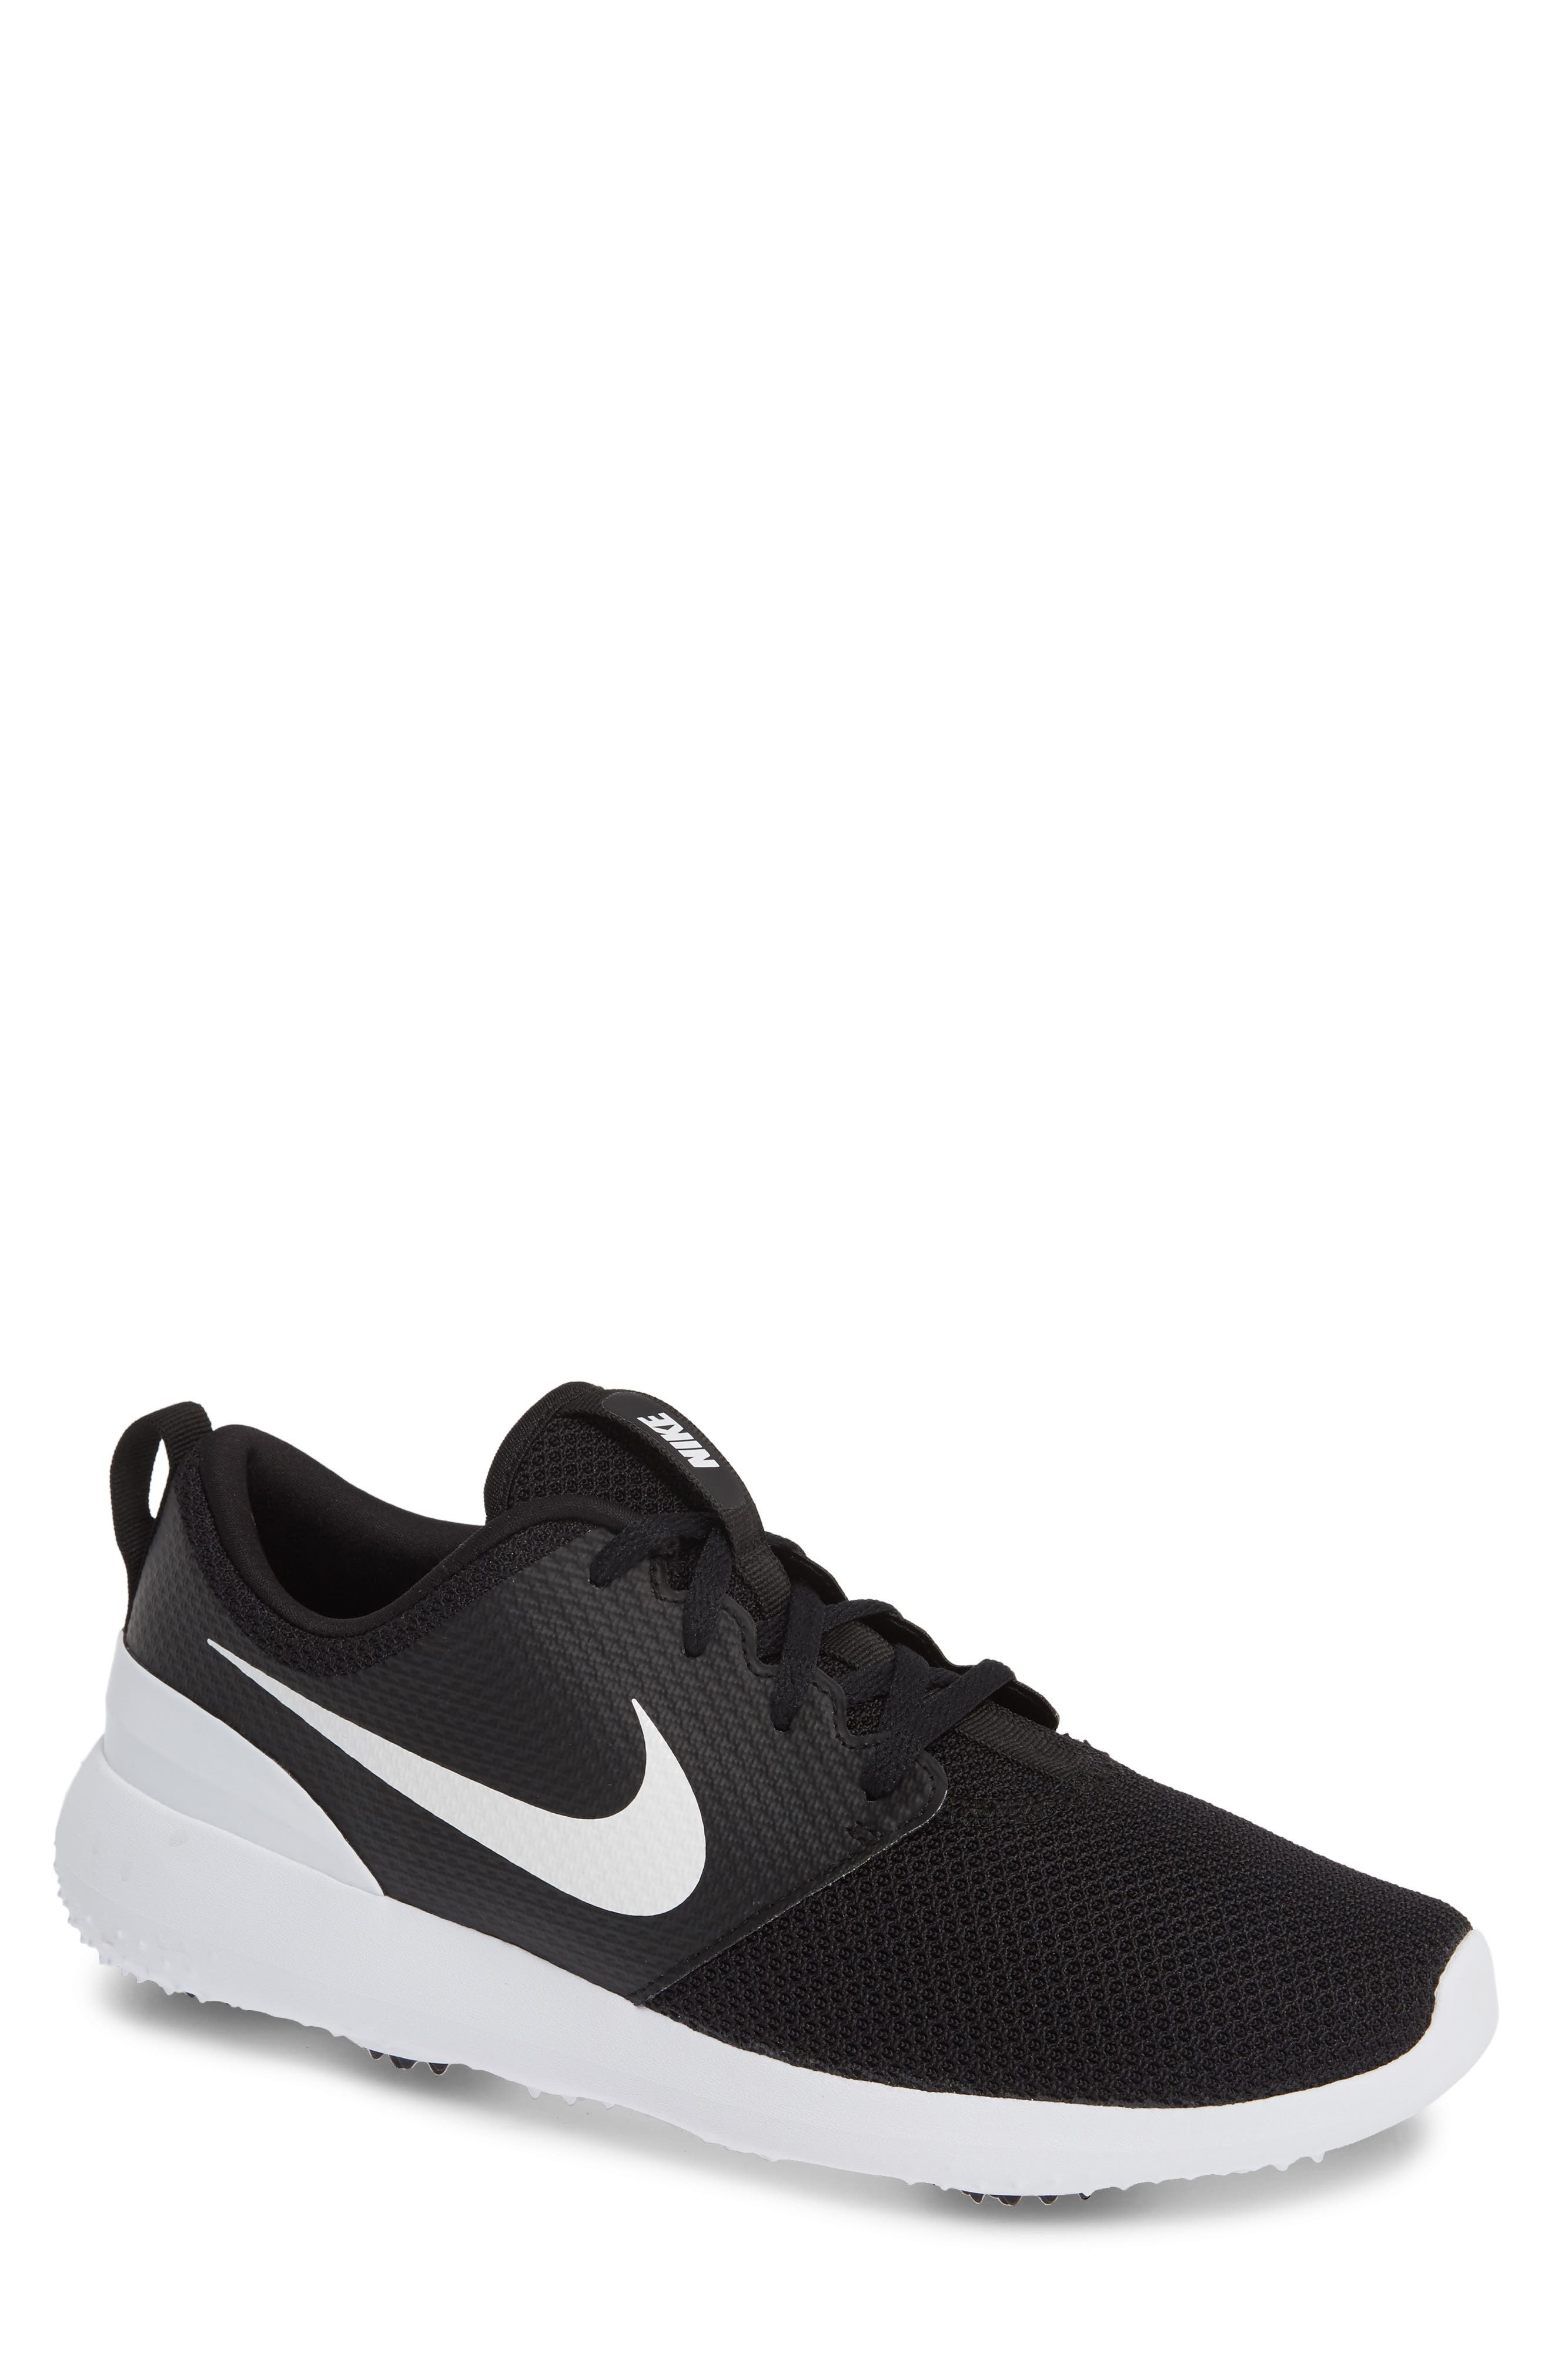 Roshe Golf Shoe,                             Main thumbnail 1, color,                             BLACK/ WHITE